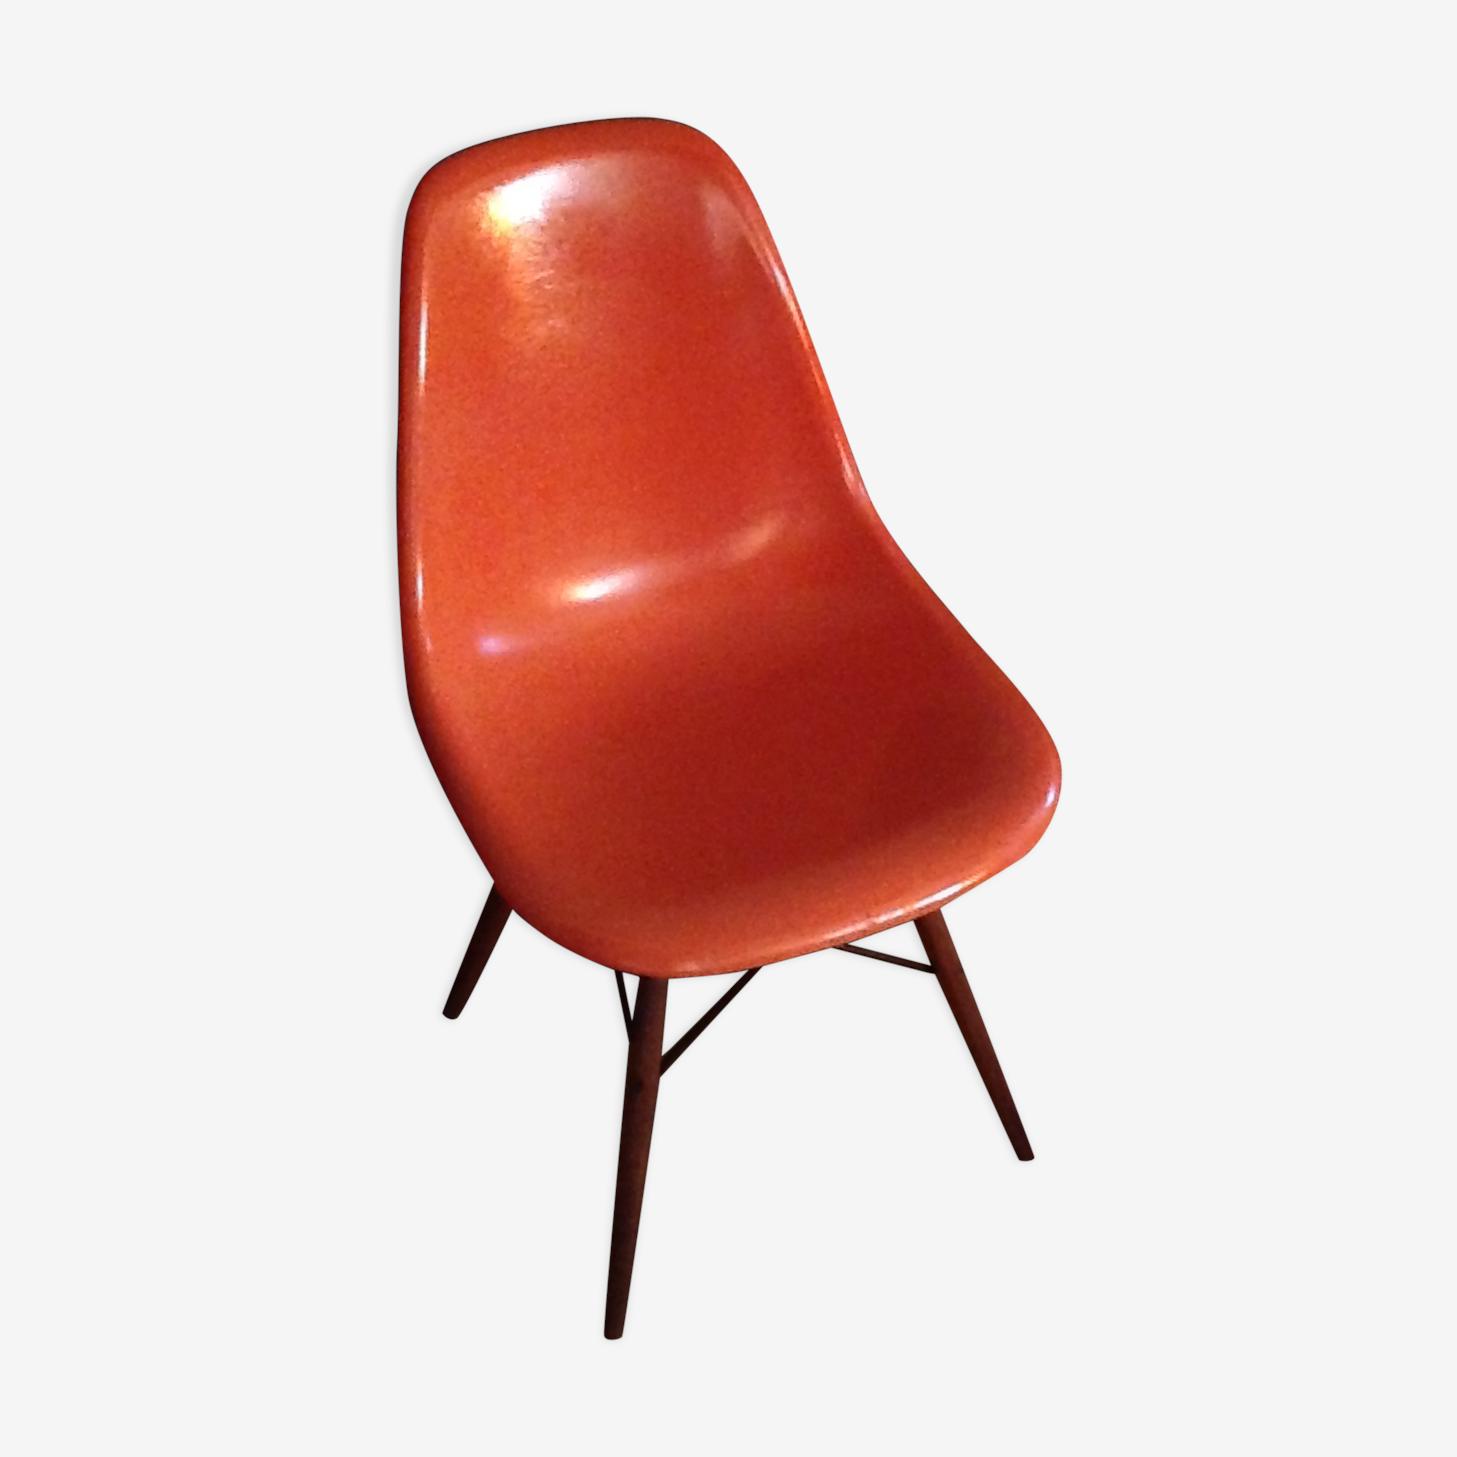 Chaise Eames DSW d'origine orange